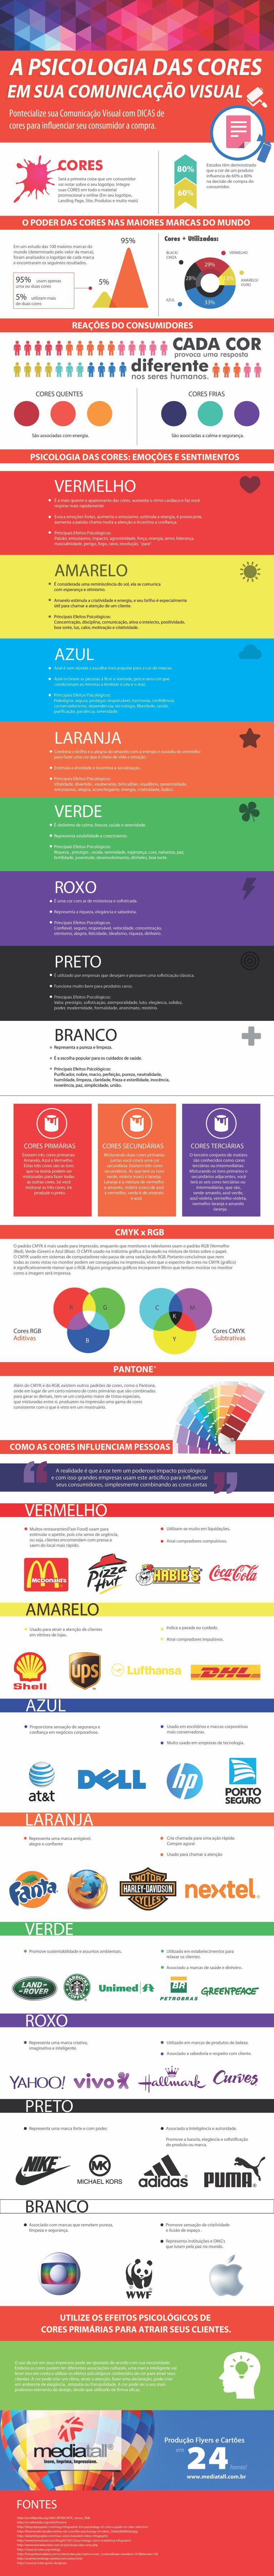 Infografico_Psicologia_Cores_OFICIAL_75dpi